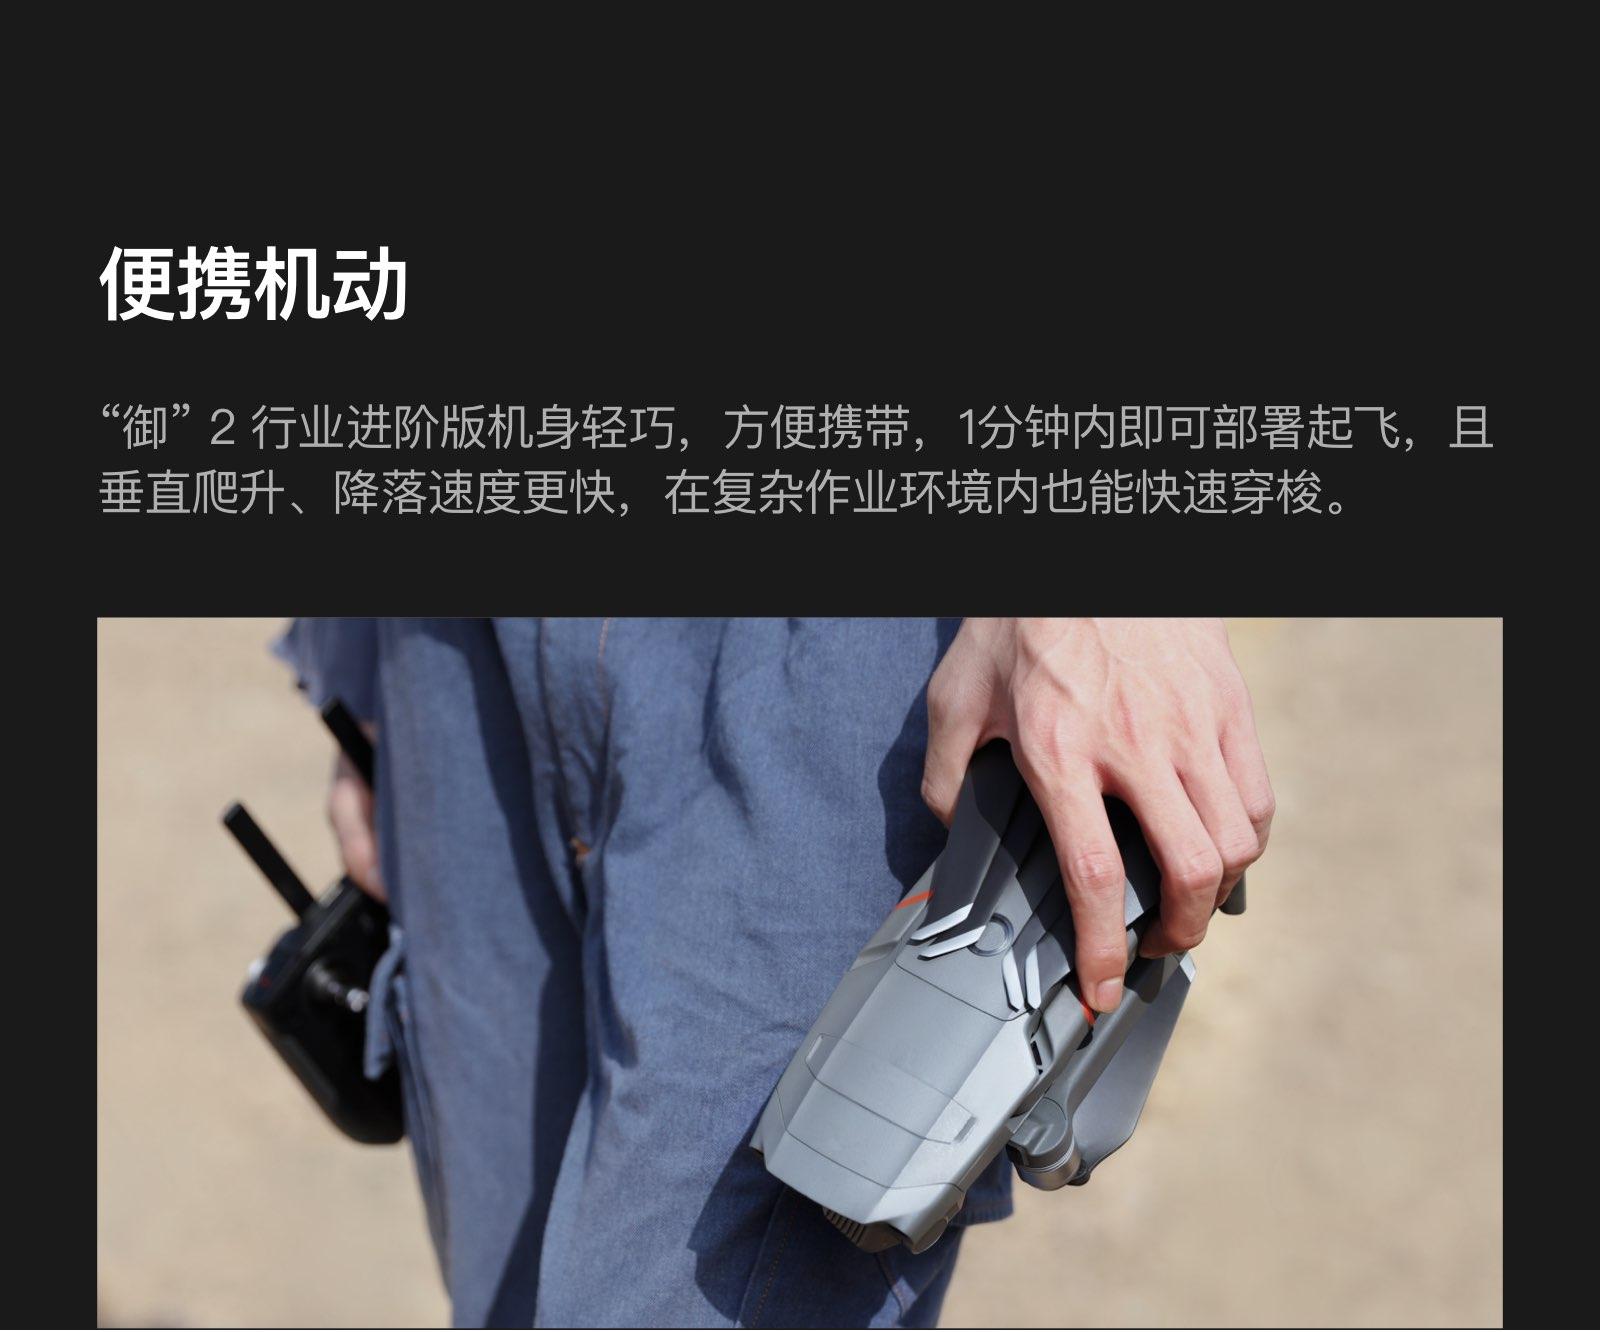 M2EA_PC%20_cn_9.jpg